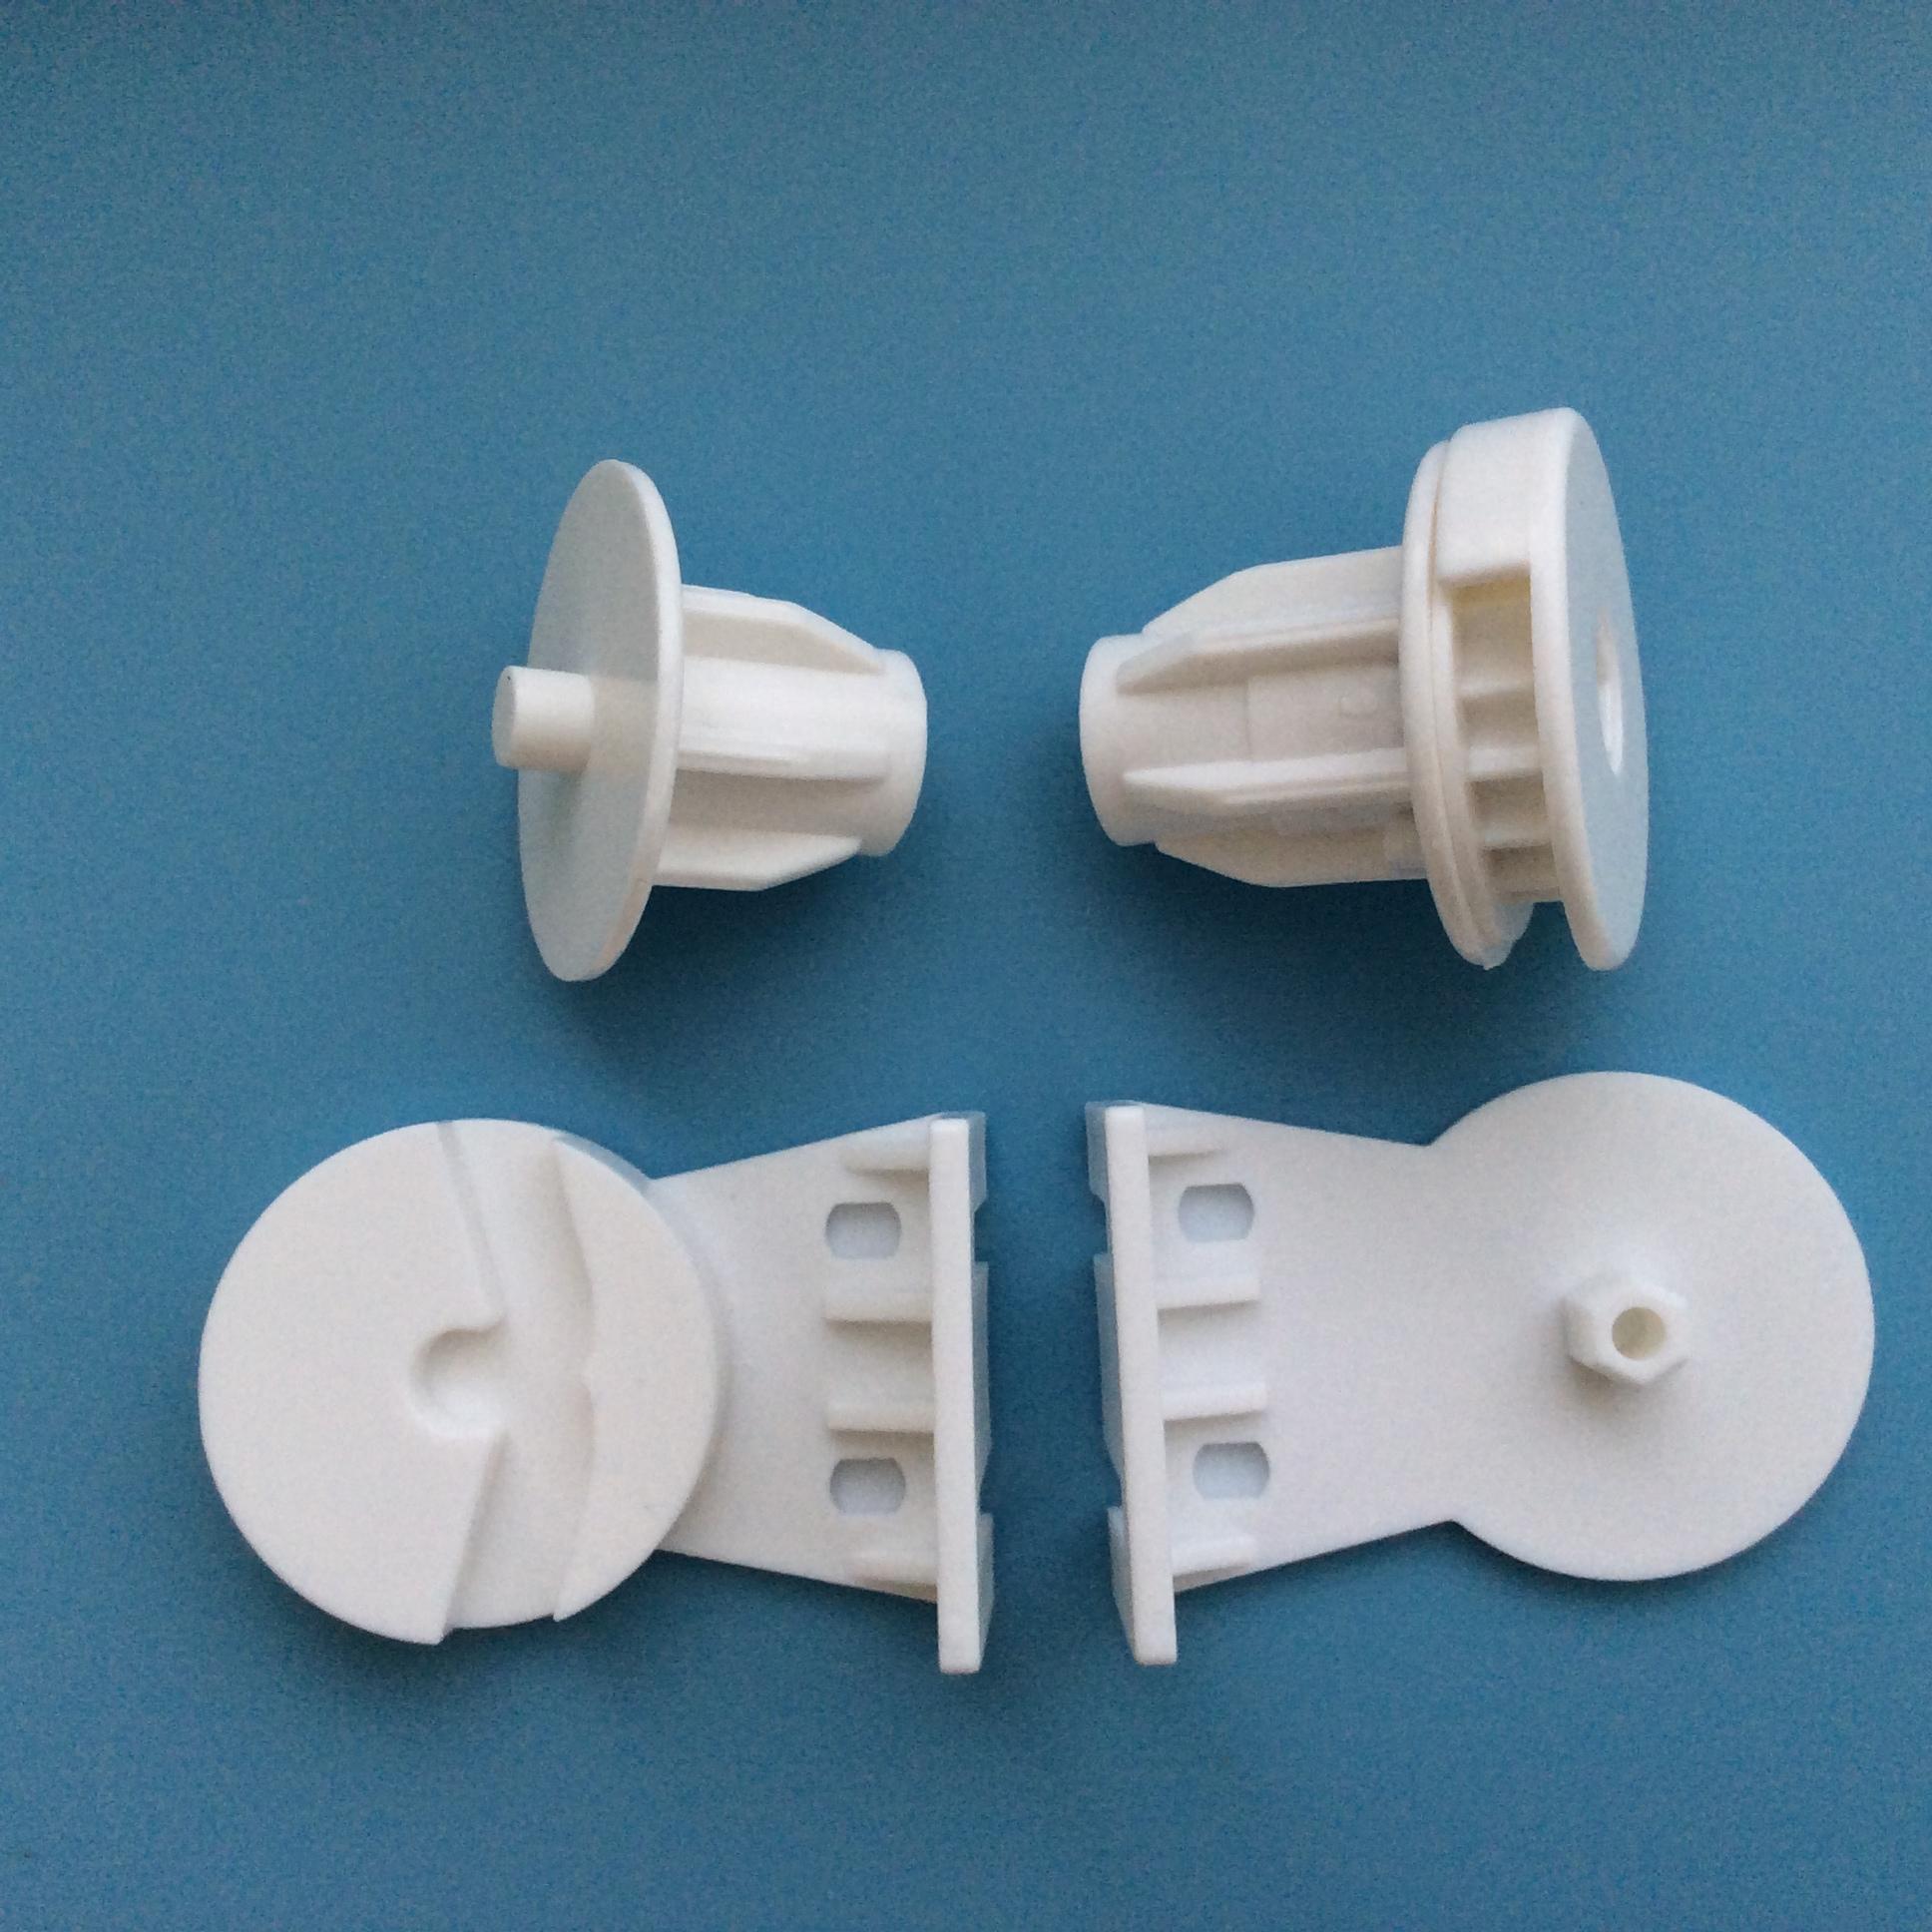 Roller Blind 25mm Diameter Control Chain Unit